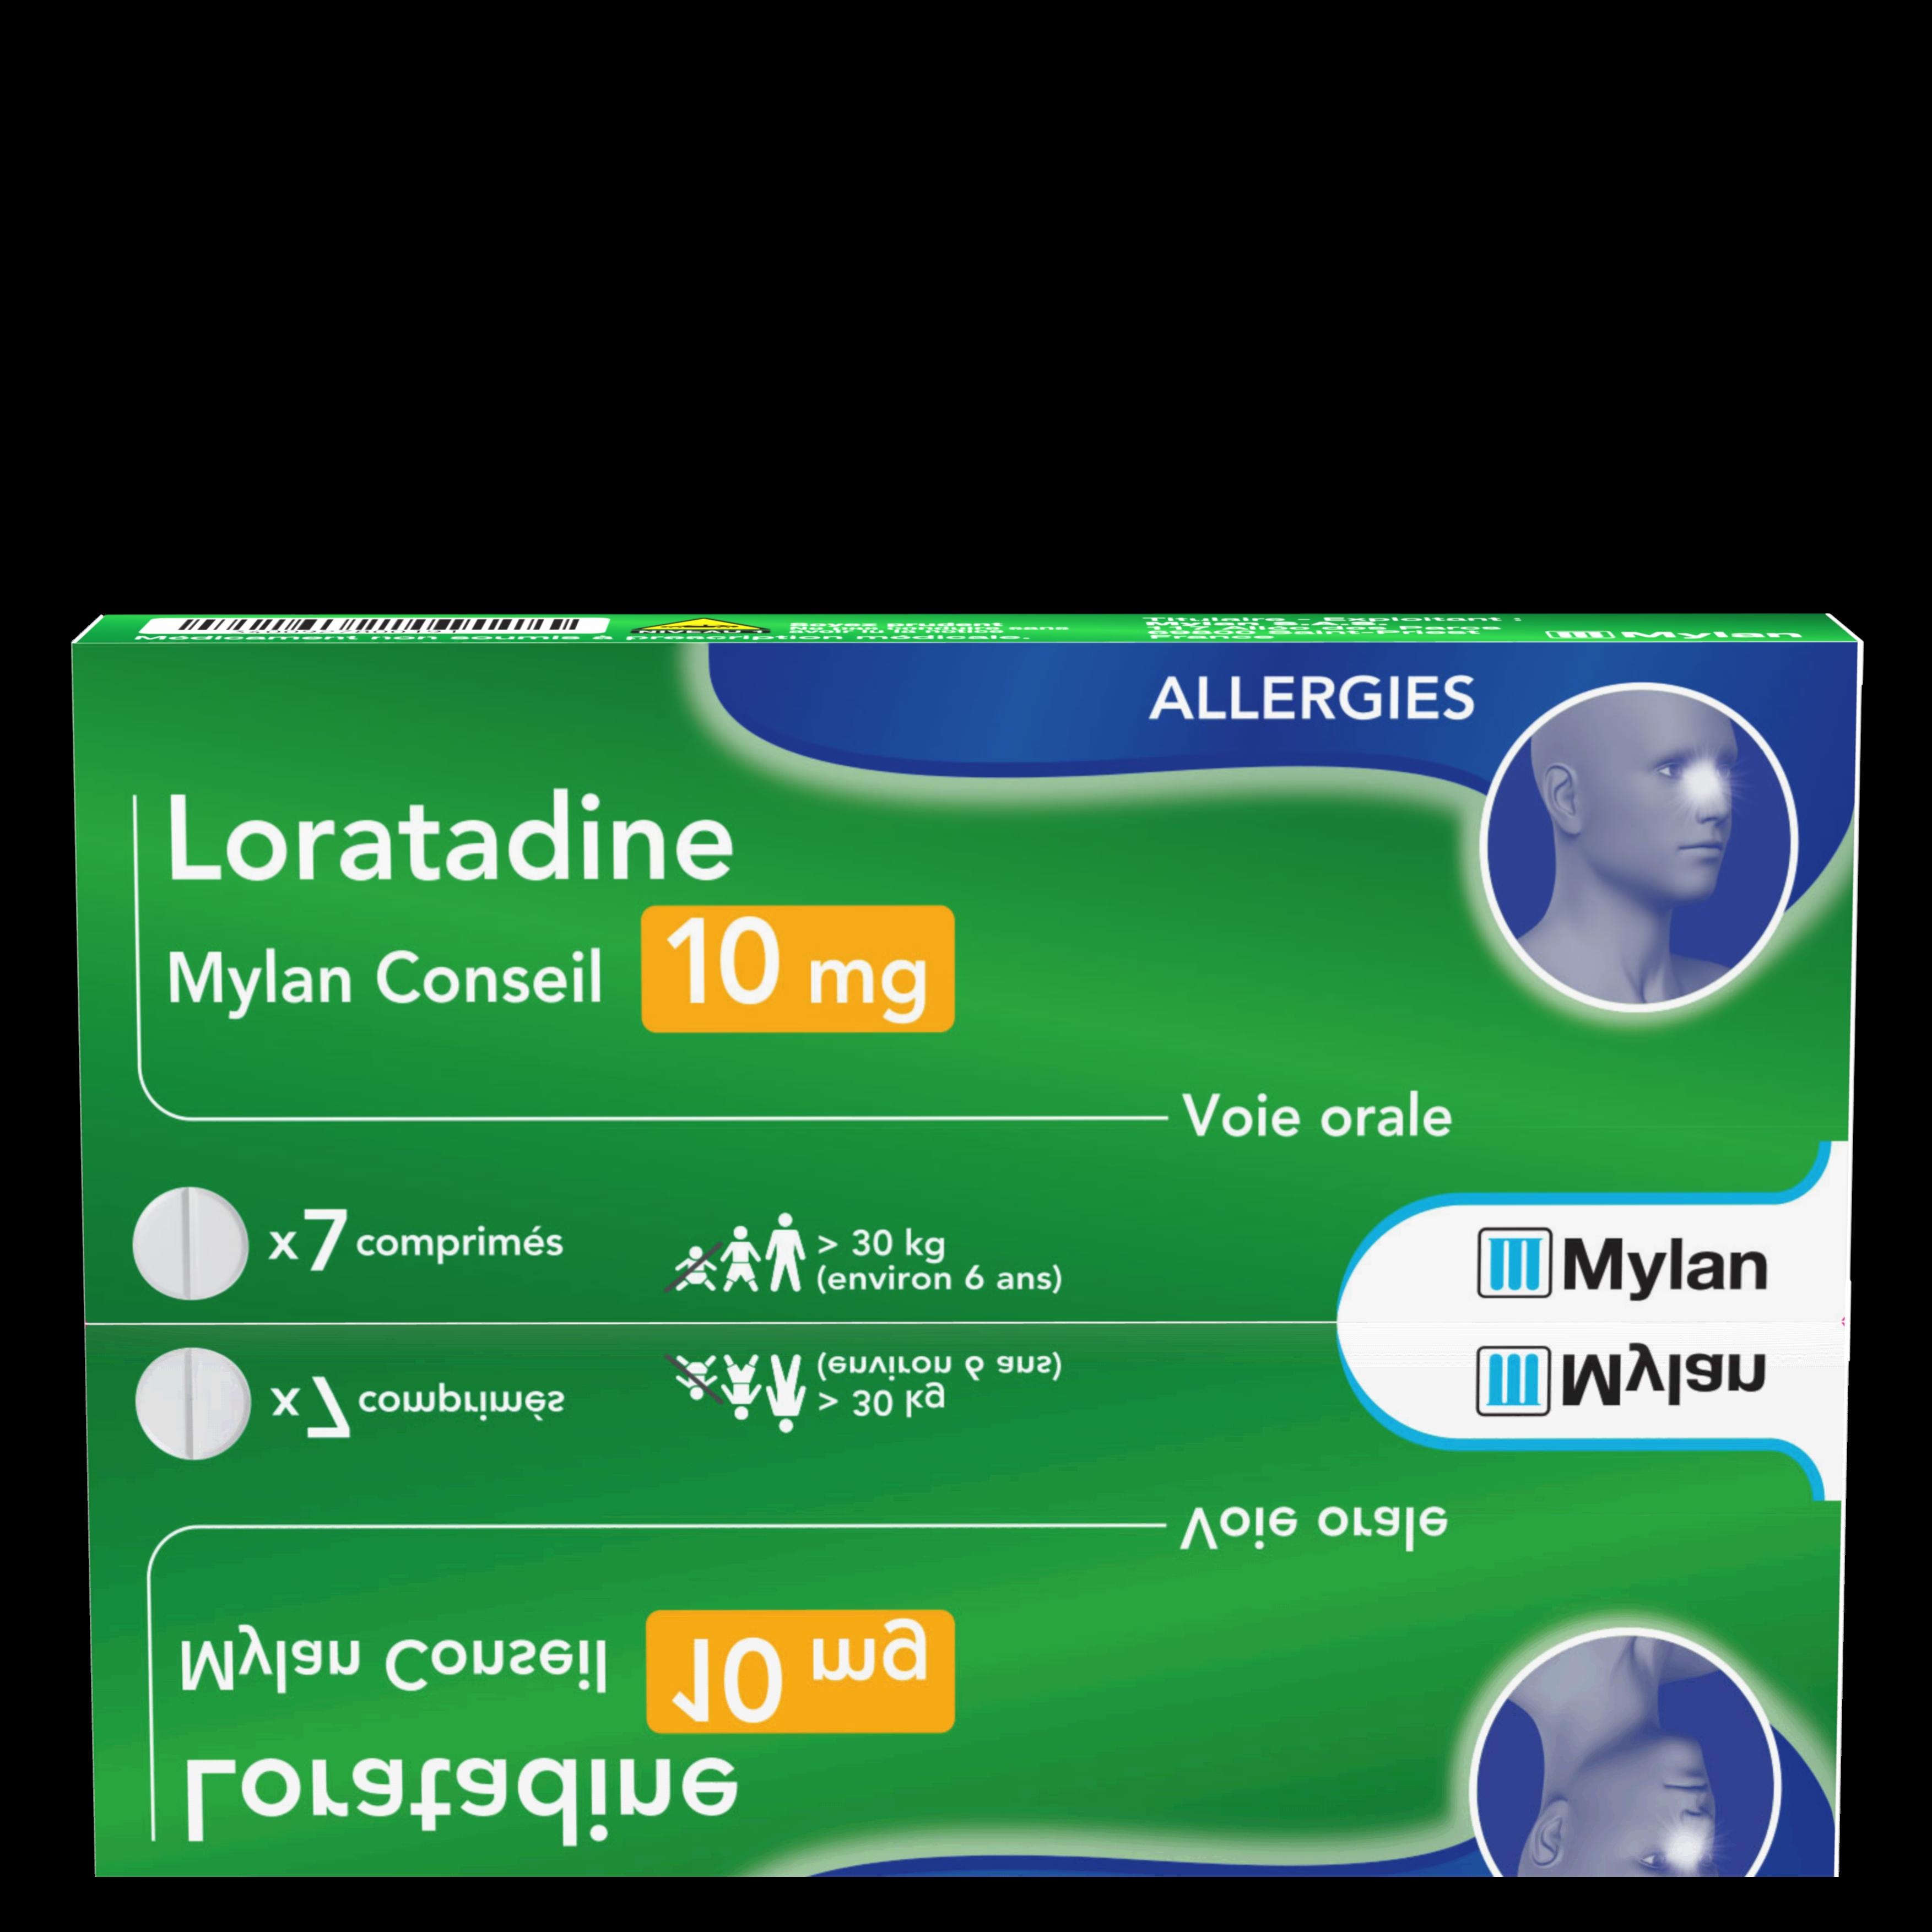 Loratadine 10 Mg 7 Comprimes